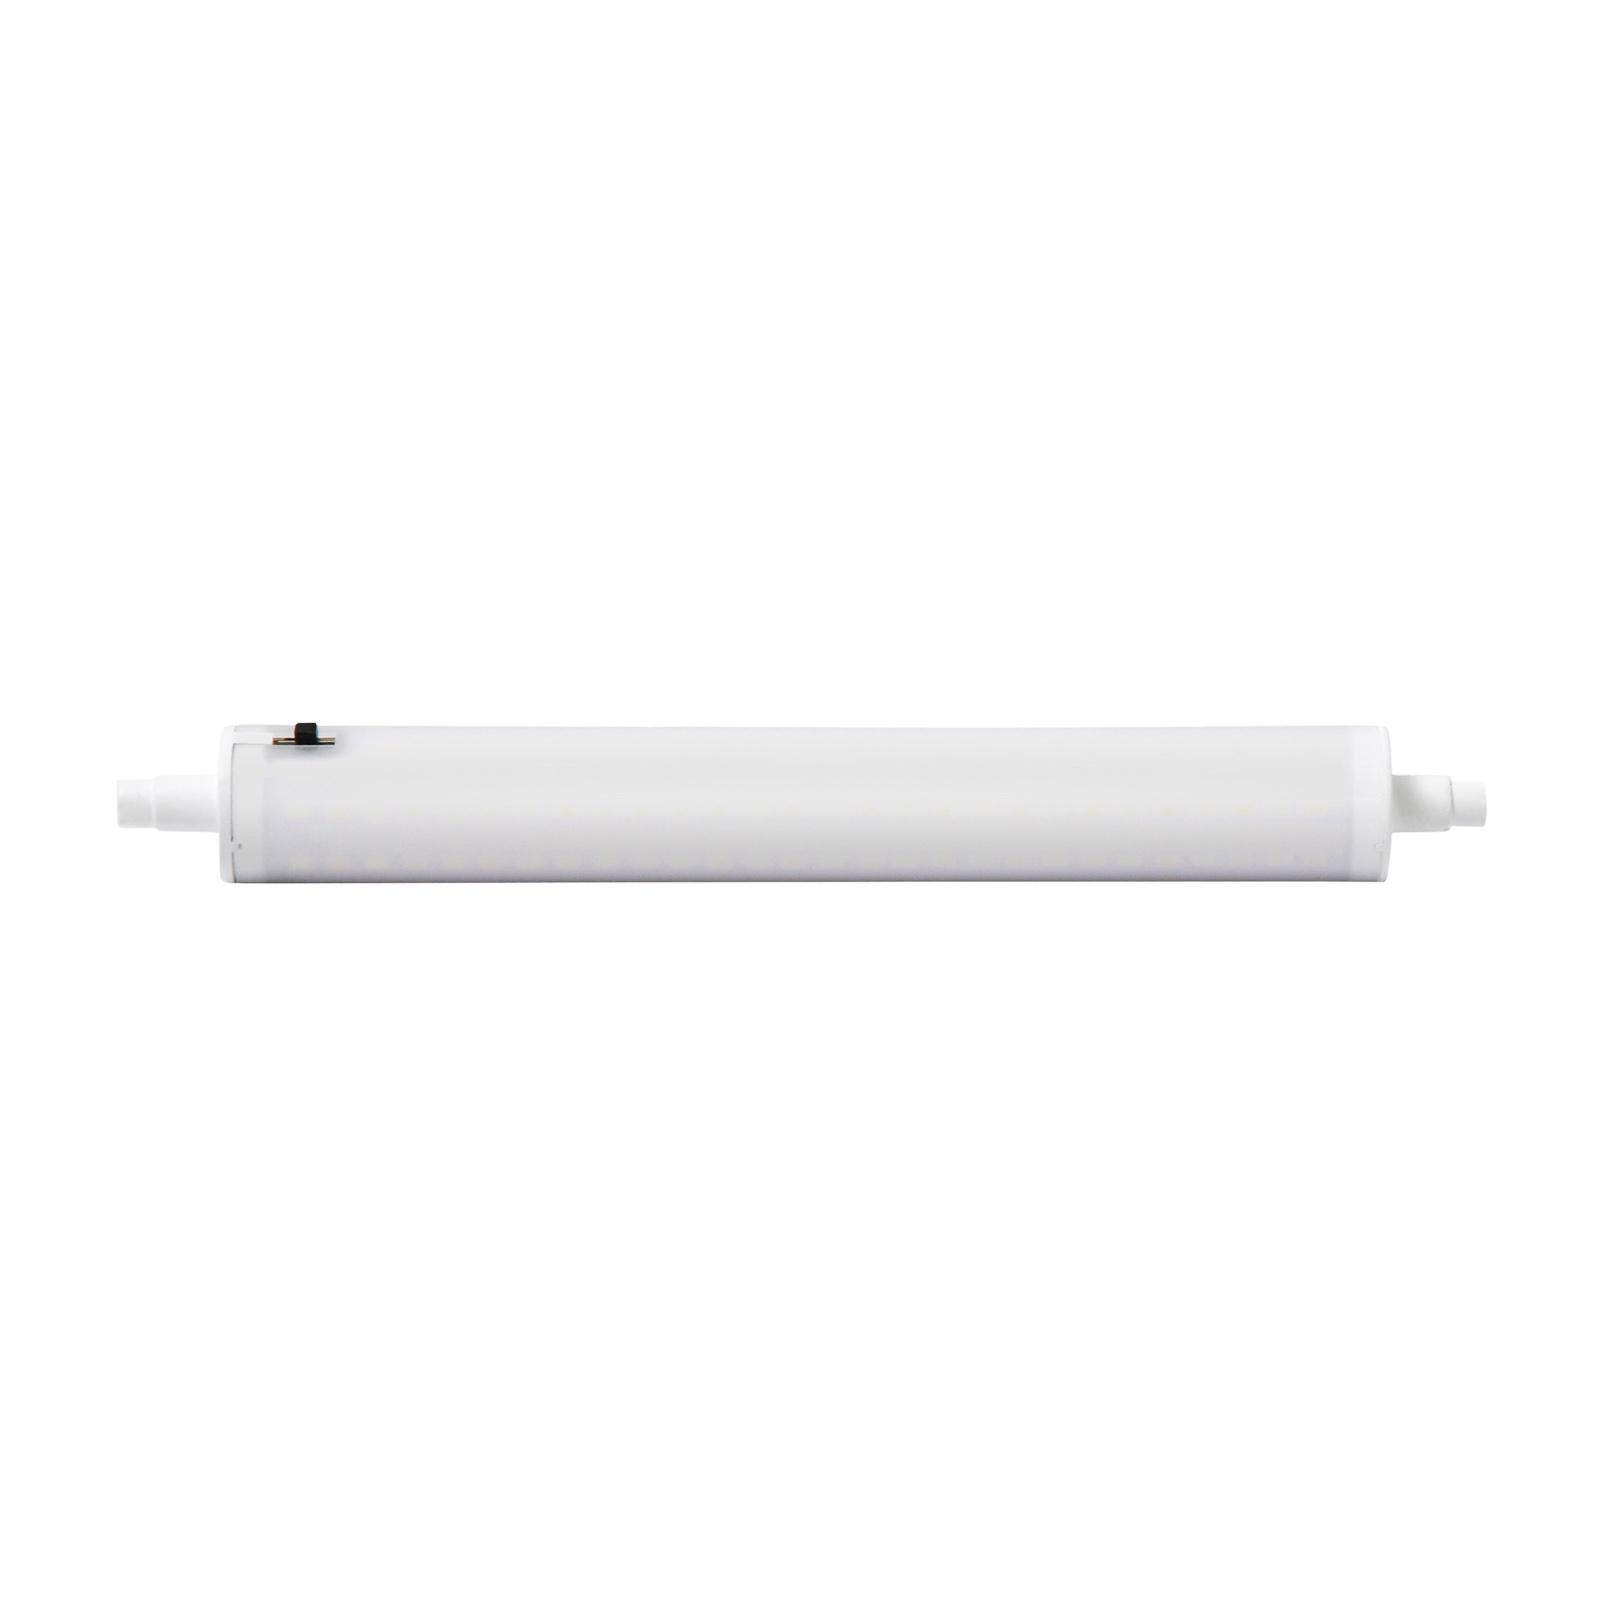 LED-Lampe R7s 10,5W, Länge 18,9 cm, 1.100 lm, CCT